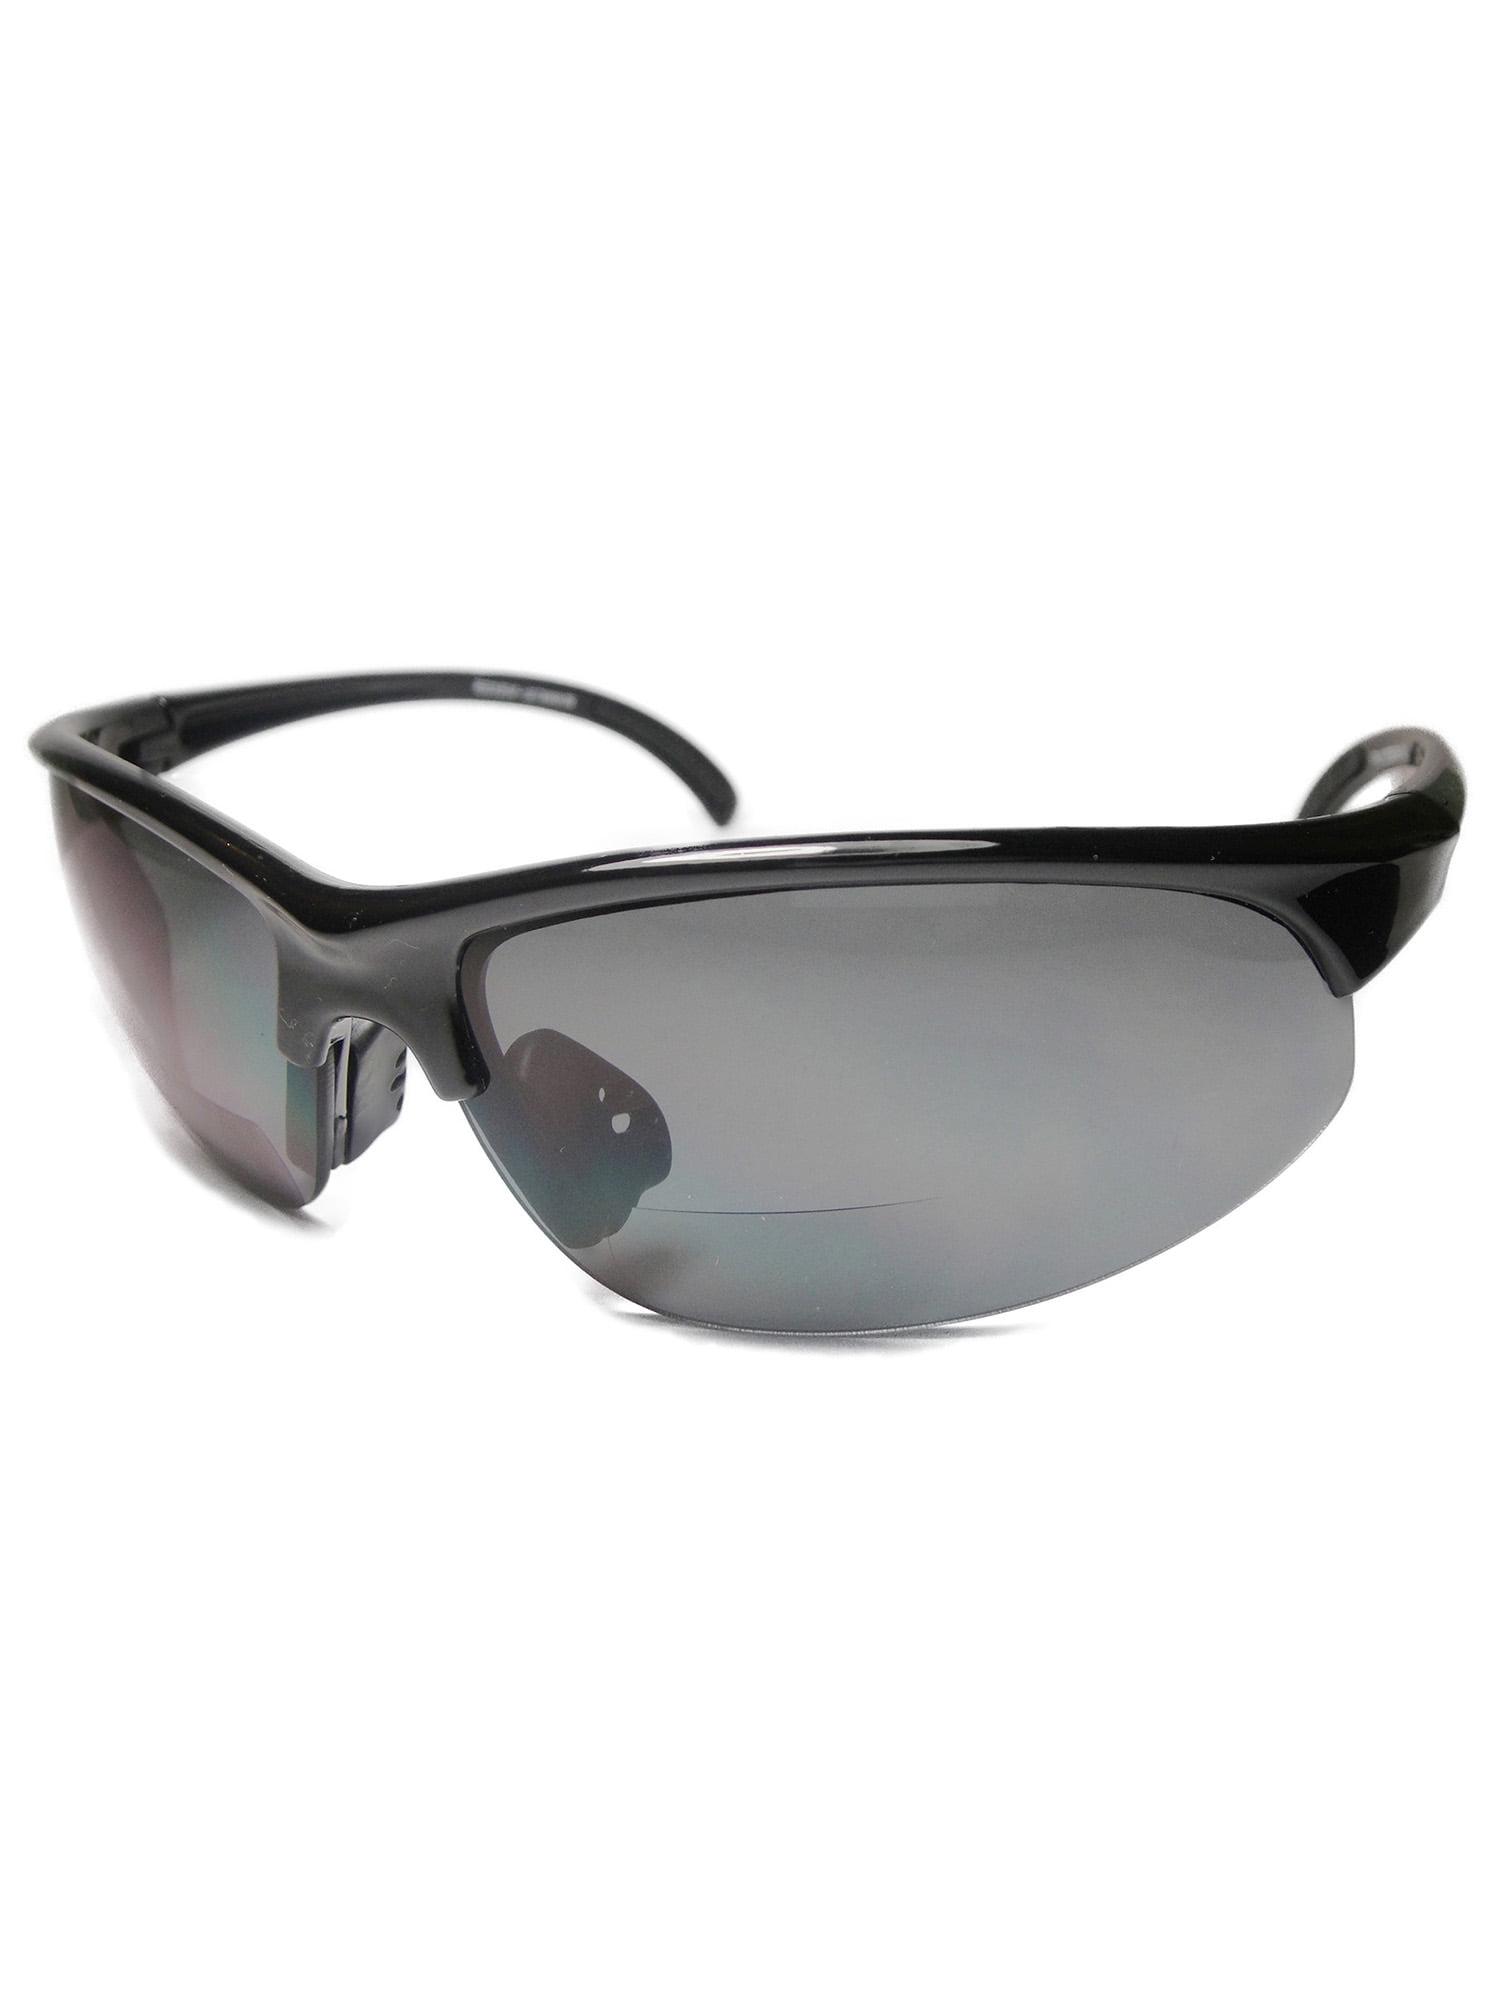 Men Bifocal Reading Sunglasses Half Rim Sports Outdoor Glasses Black +2.50